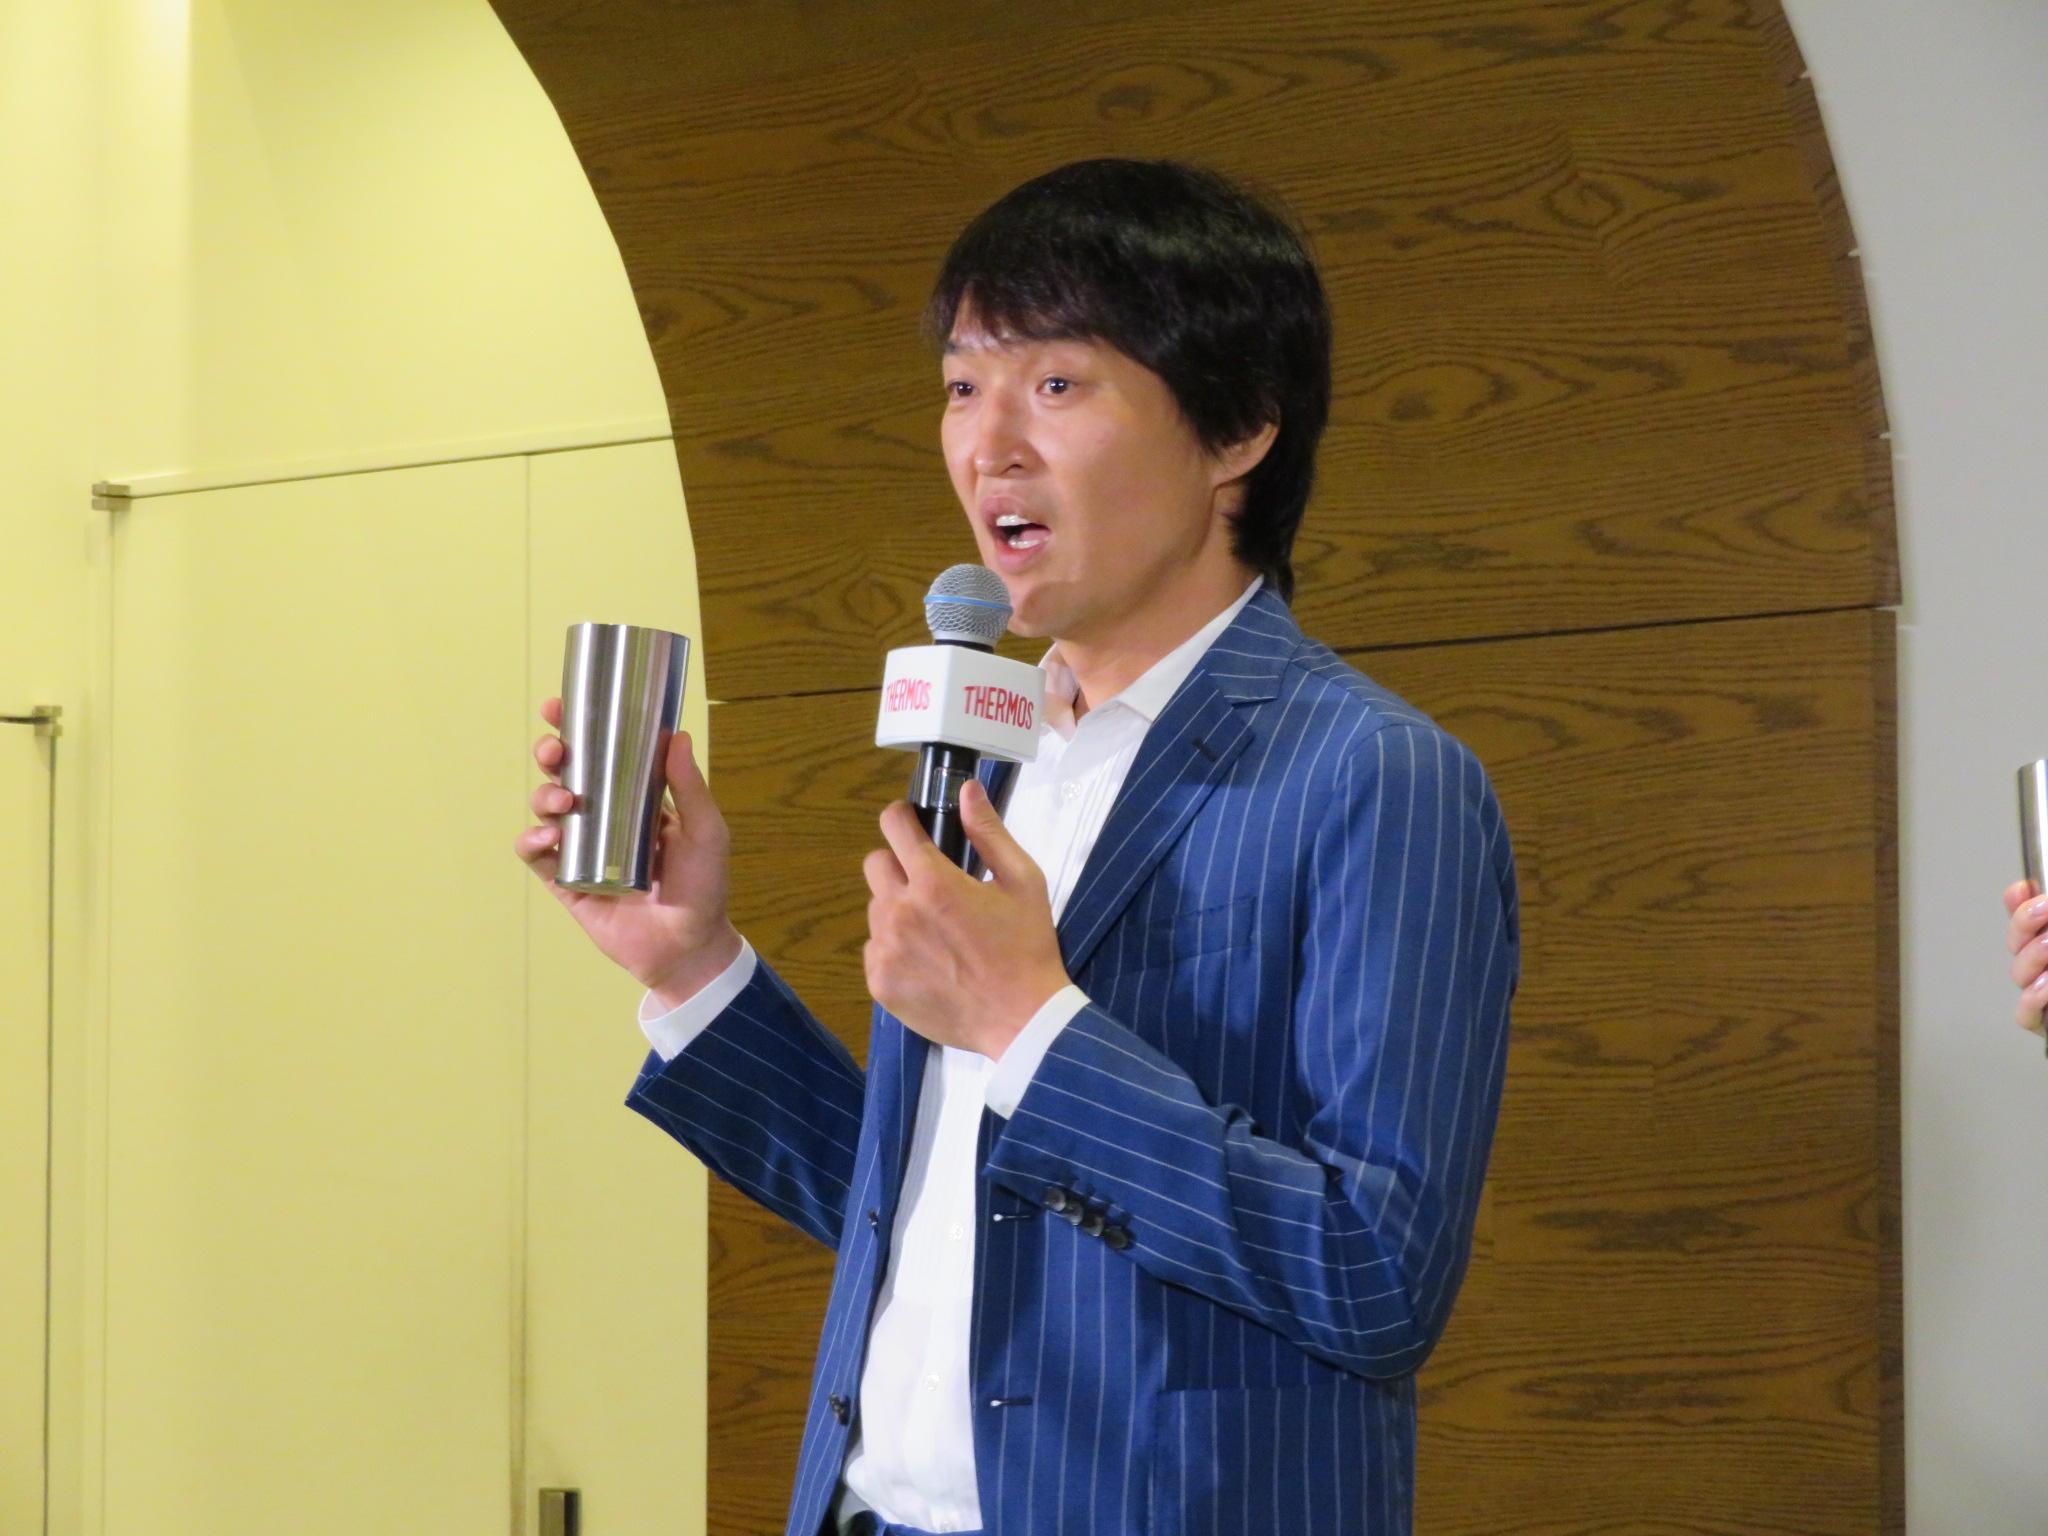 http://news.yoshimoto.co.jp/20180601001412-f6afdacc7b929195ca938dfc84e95bfc022eb0ce.jpg